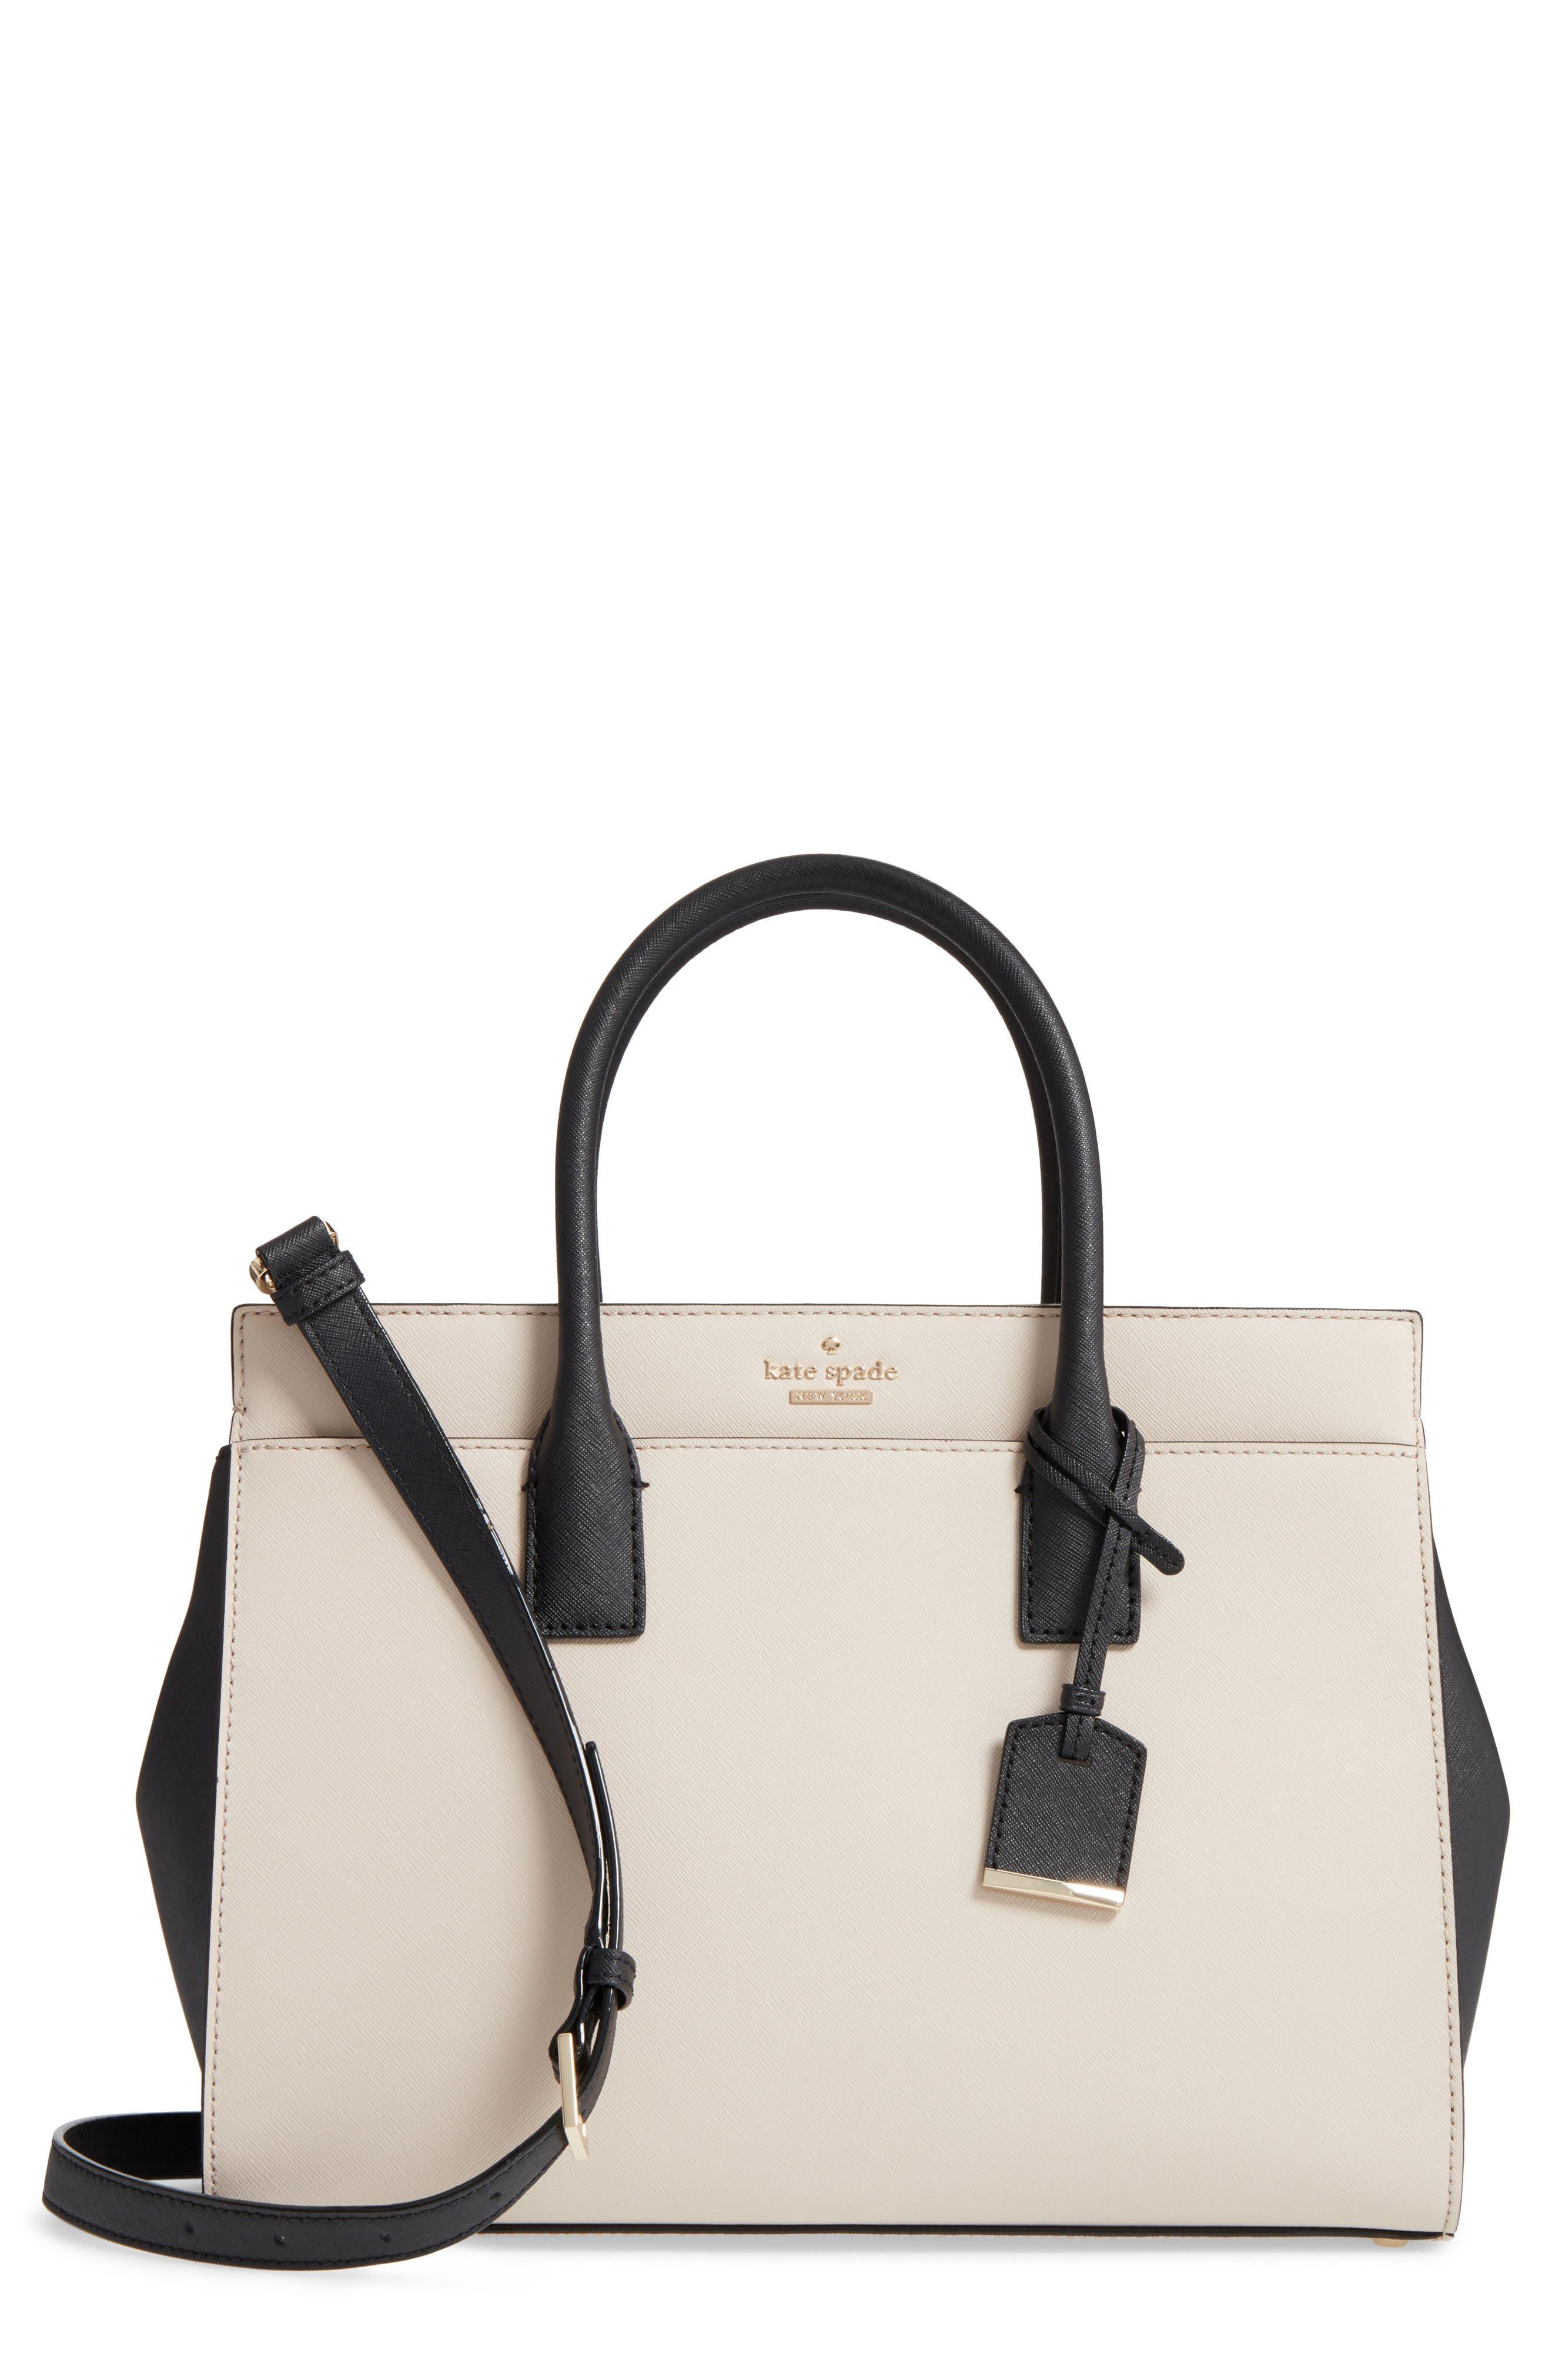 cameron street - candace leather satchel,                             Main thumbnail 1, color,                             Tusk/ Black